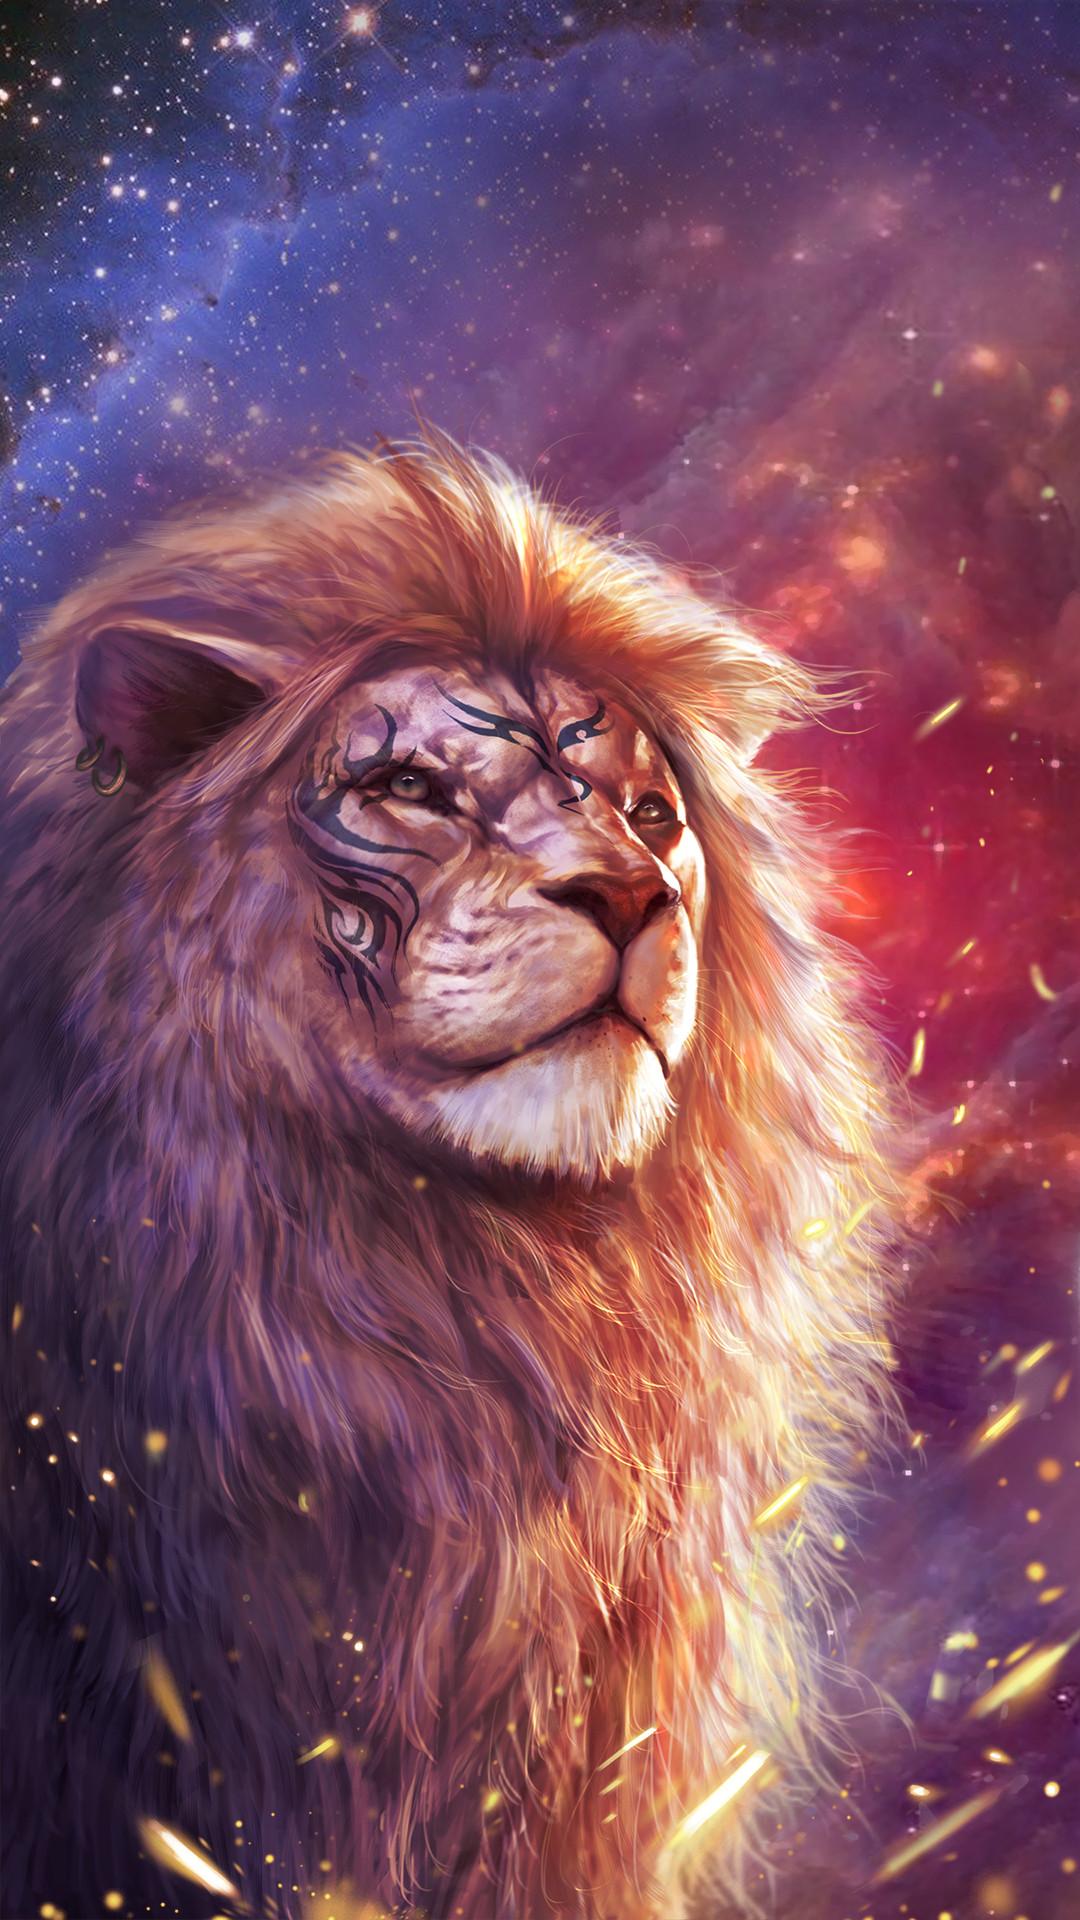 Lion Wallpaper Iphone X , HD Wallpaper & Backgrounds